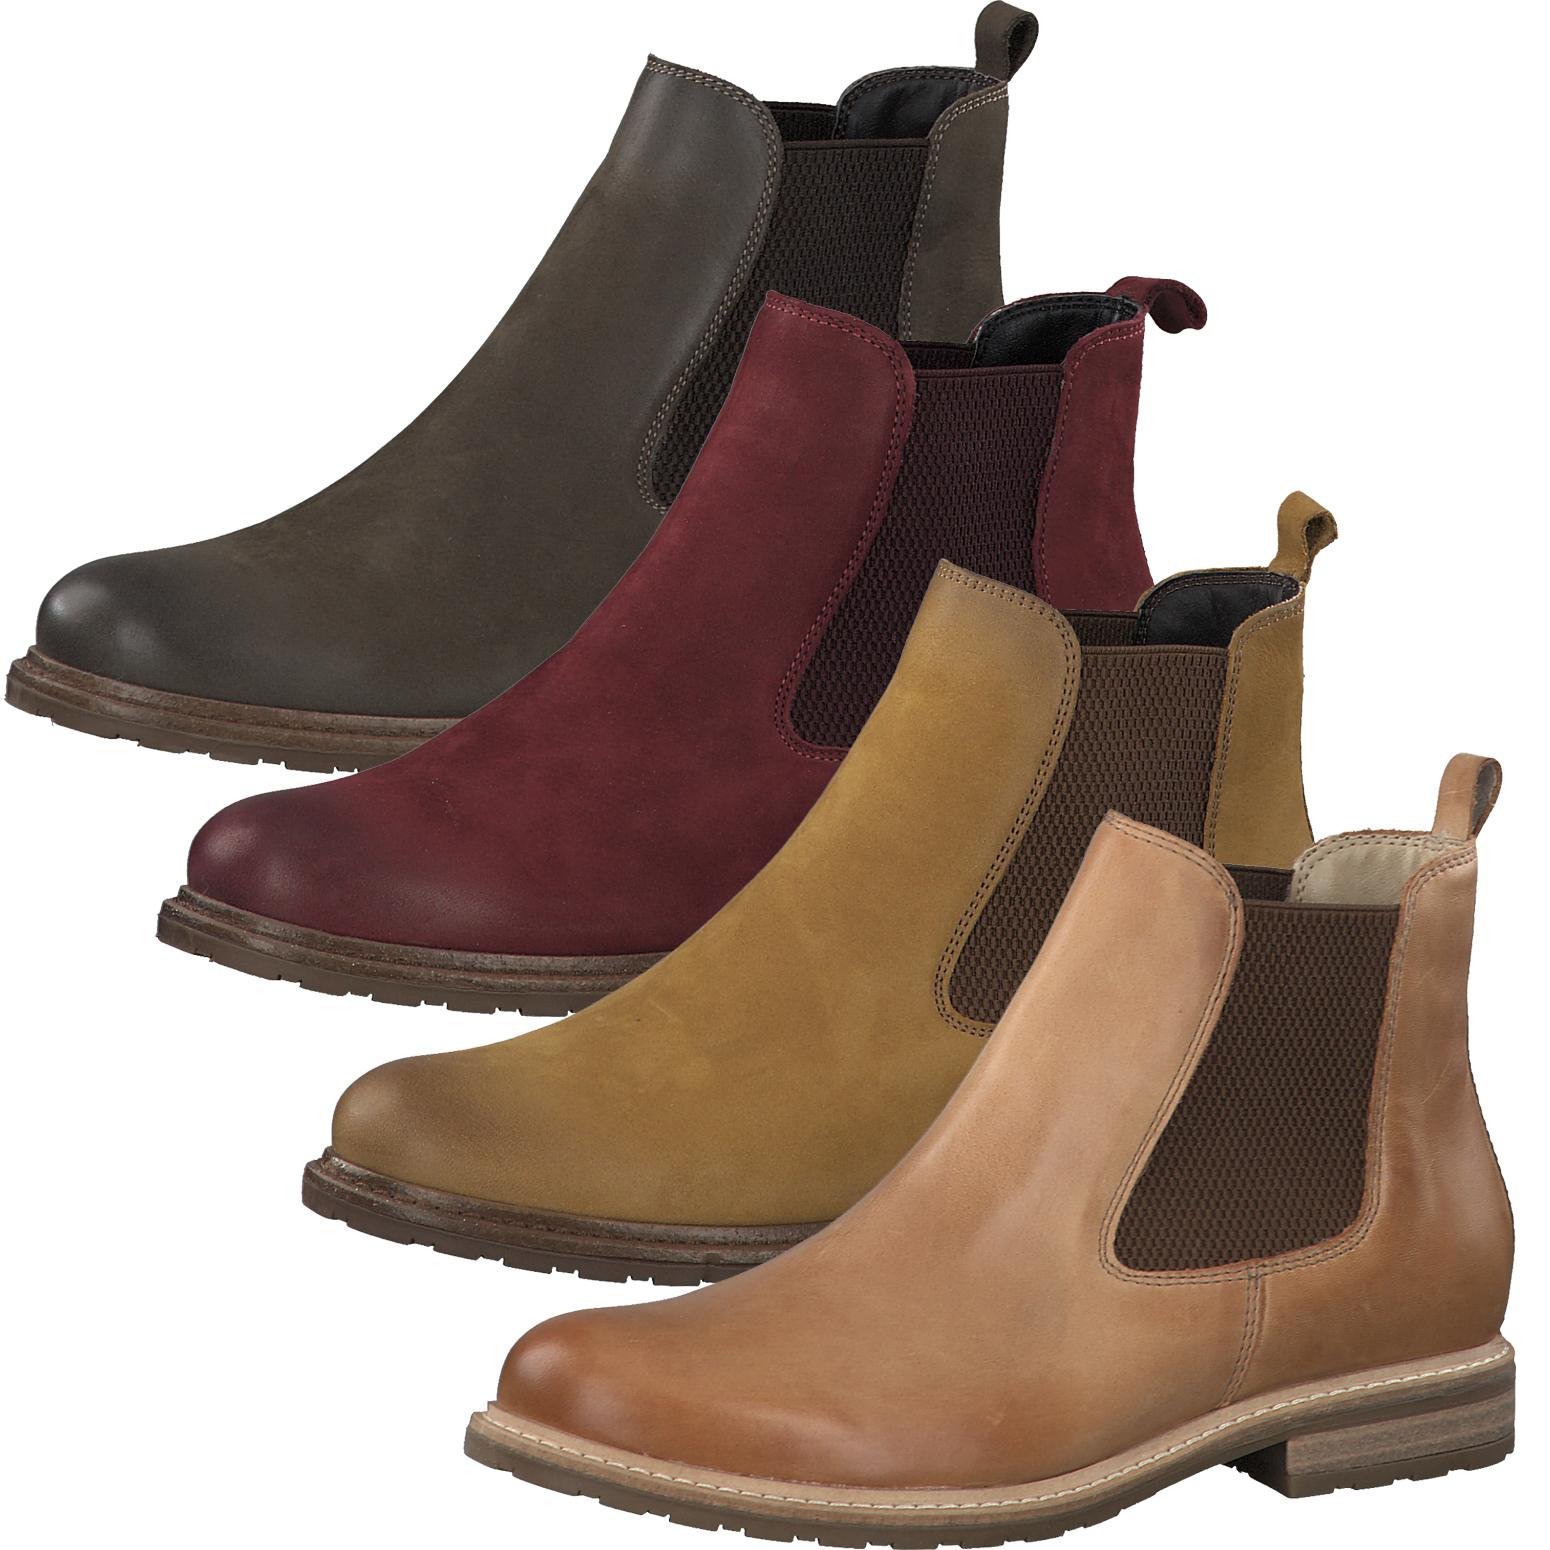 Tamaris Damen Stiefeletten Leder Chelsea Boots 1 25056 25